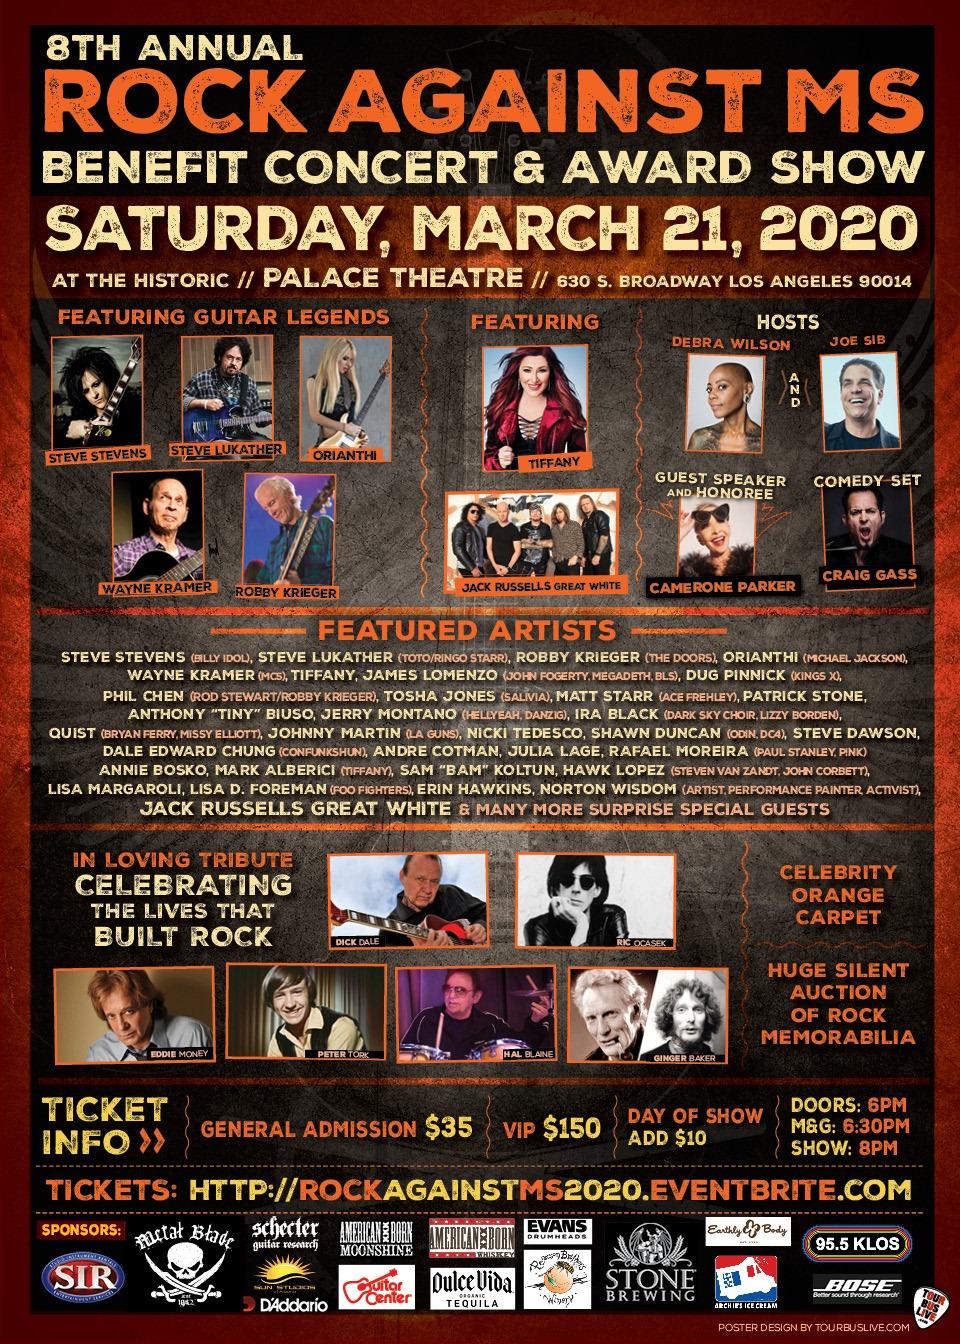 ROBBY KRIEGER (The Doors) STEVE STEVENS (Billy Idol) ORIANTHI (Michael Jackson) STEVE LUKATHER (Toto) WAYNE KRAMER (MC5) Added To The 8th Annual Rock Against MS Concert